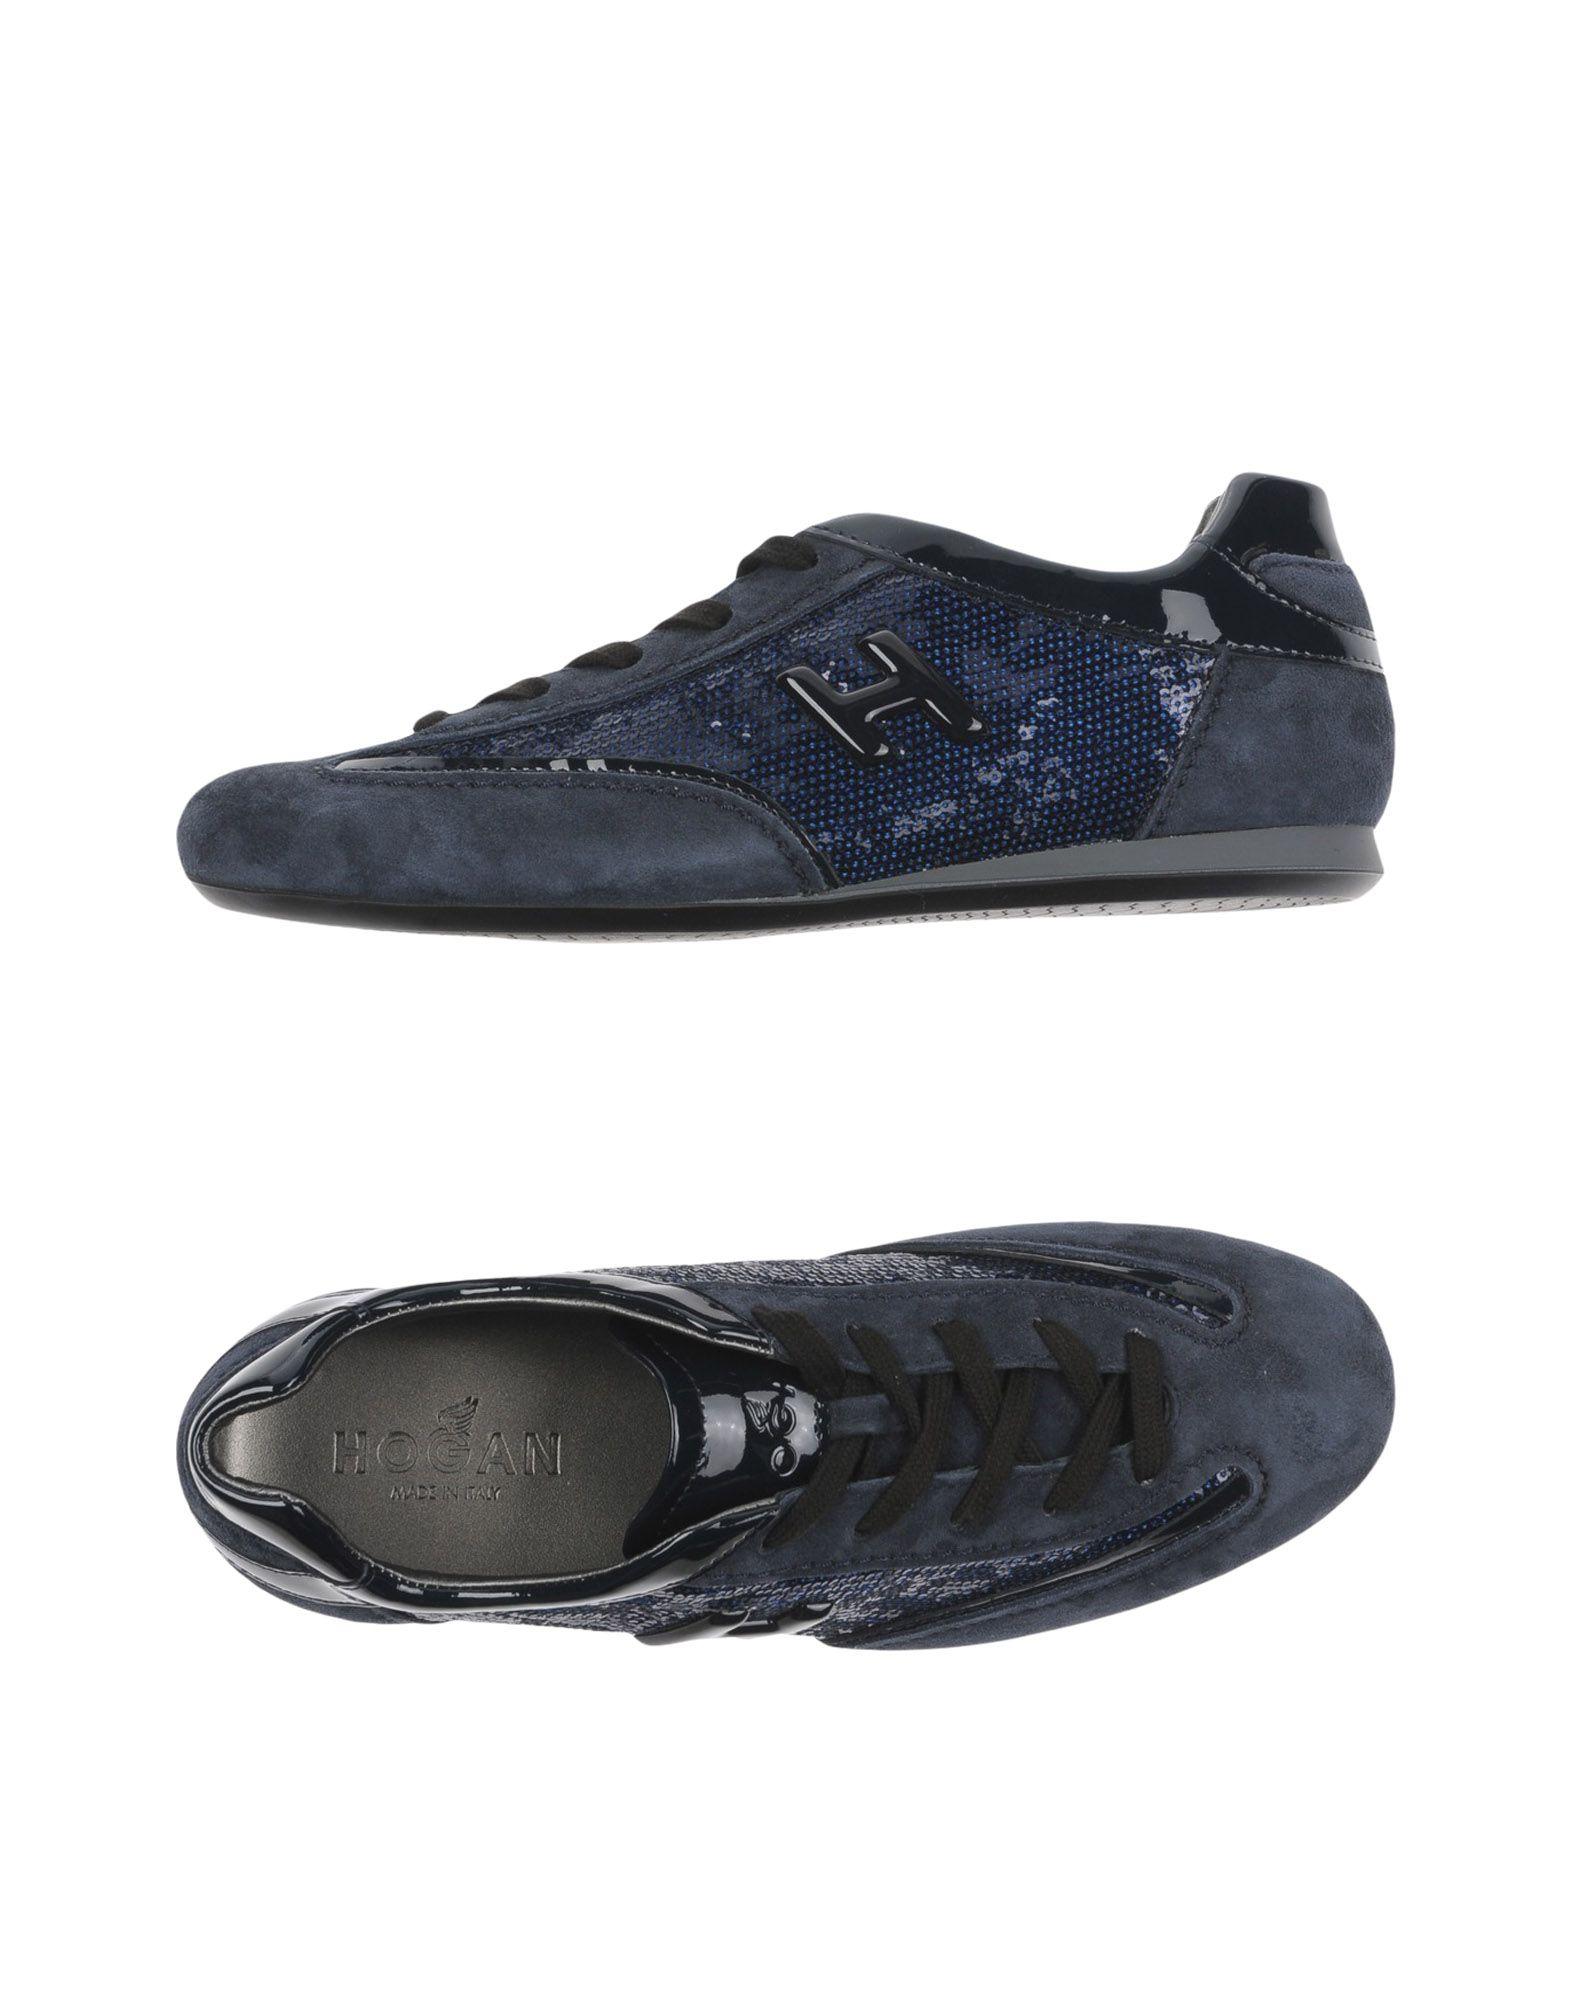 HOGAN Damen Low Sneakers & Tennisschuhe Farbe Blau Größe 2